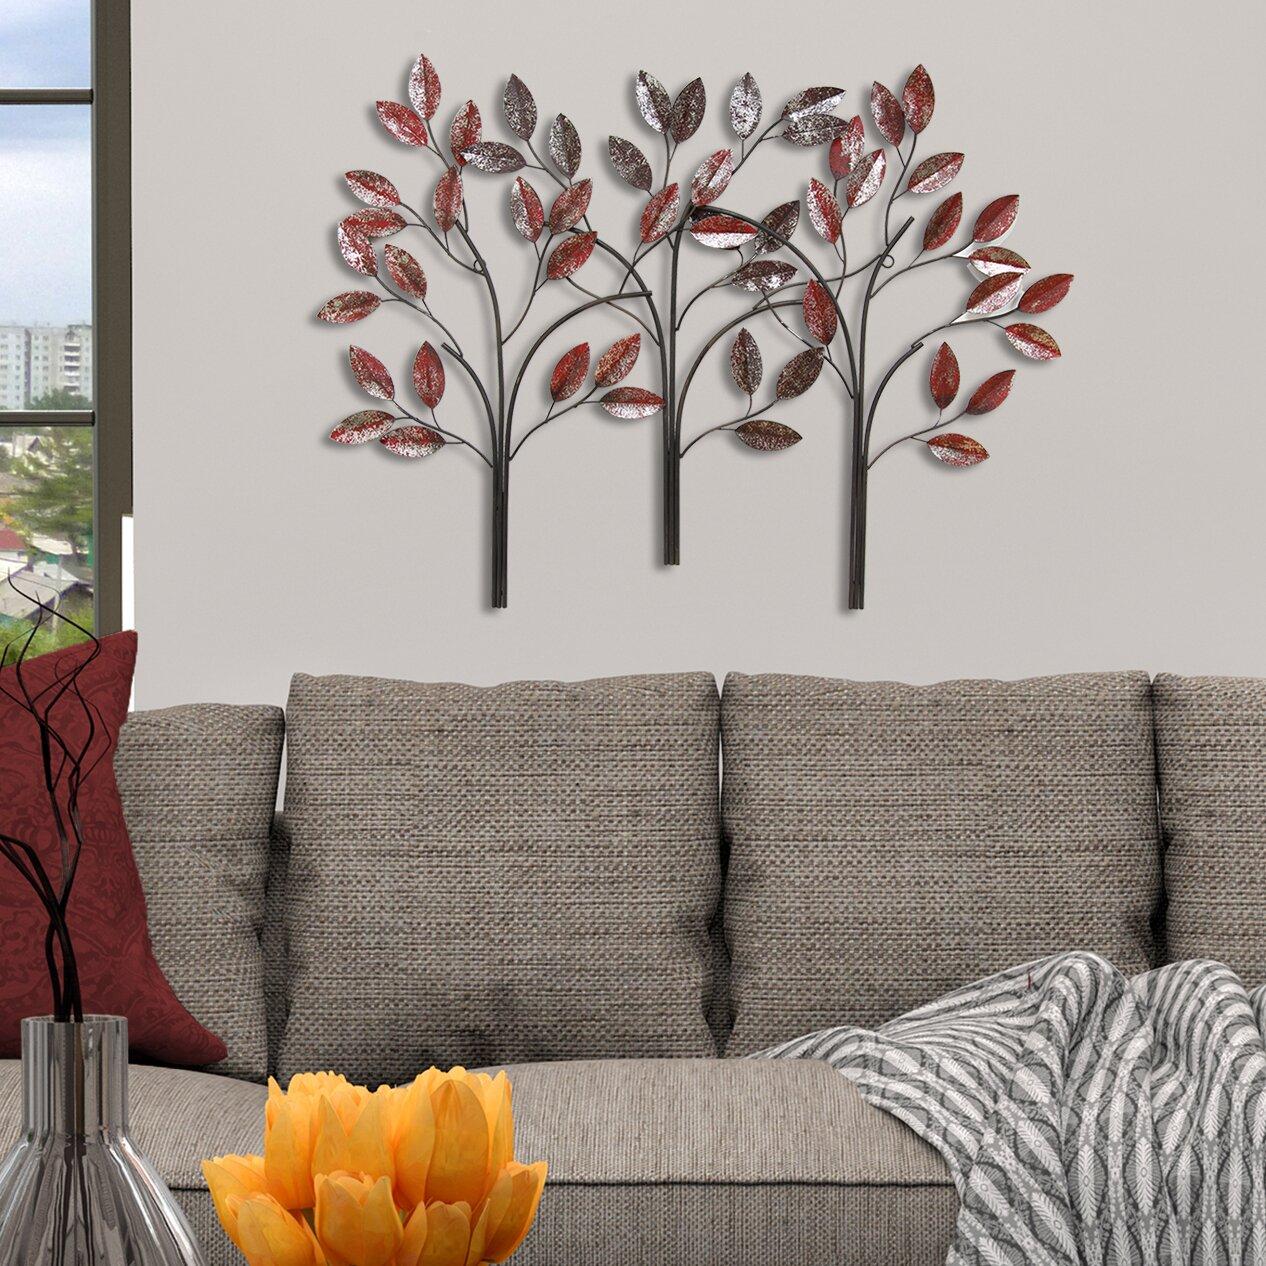 Stratton Home Decor Ombre Trees Wall D Cor Reviews Wayfair